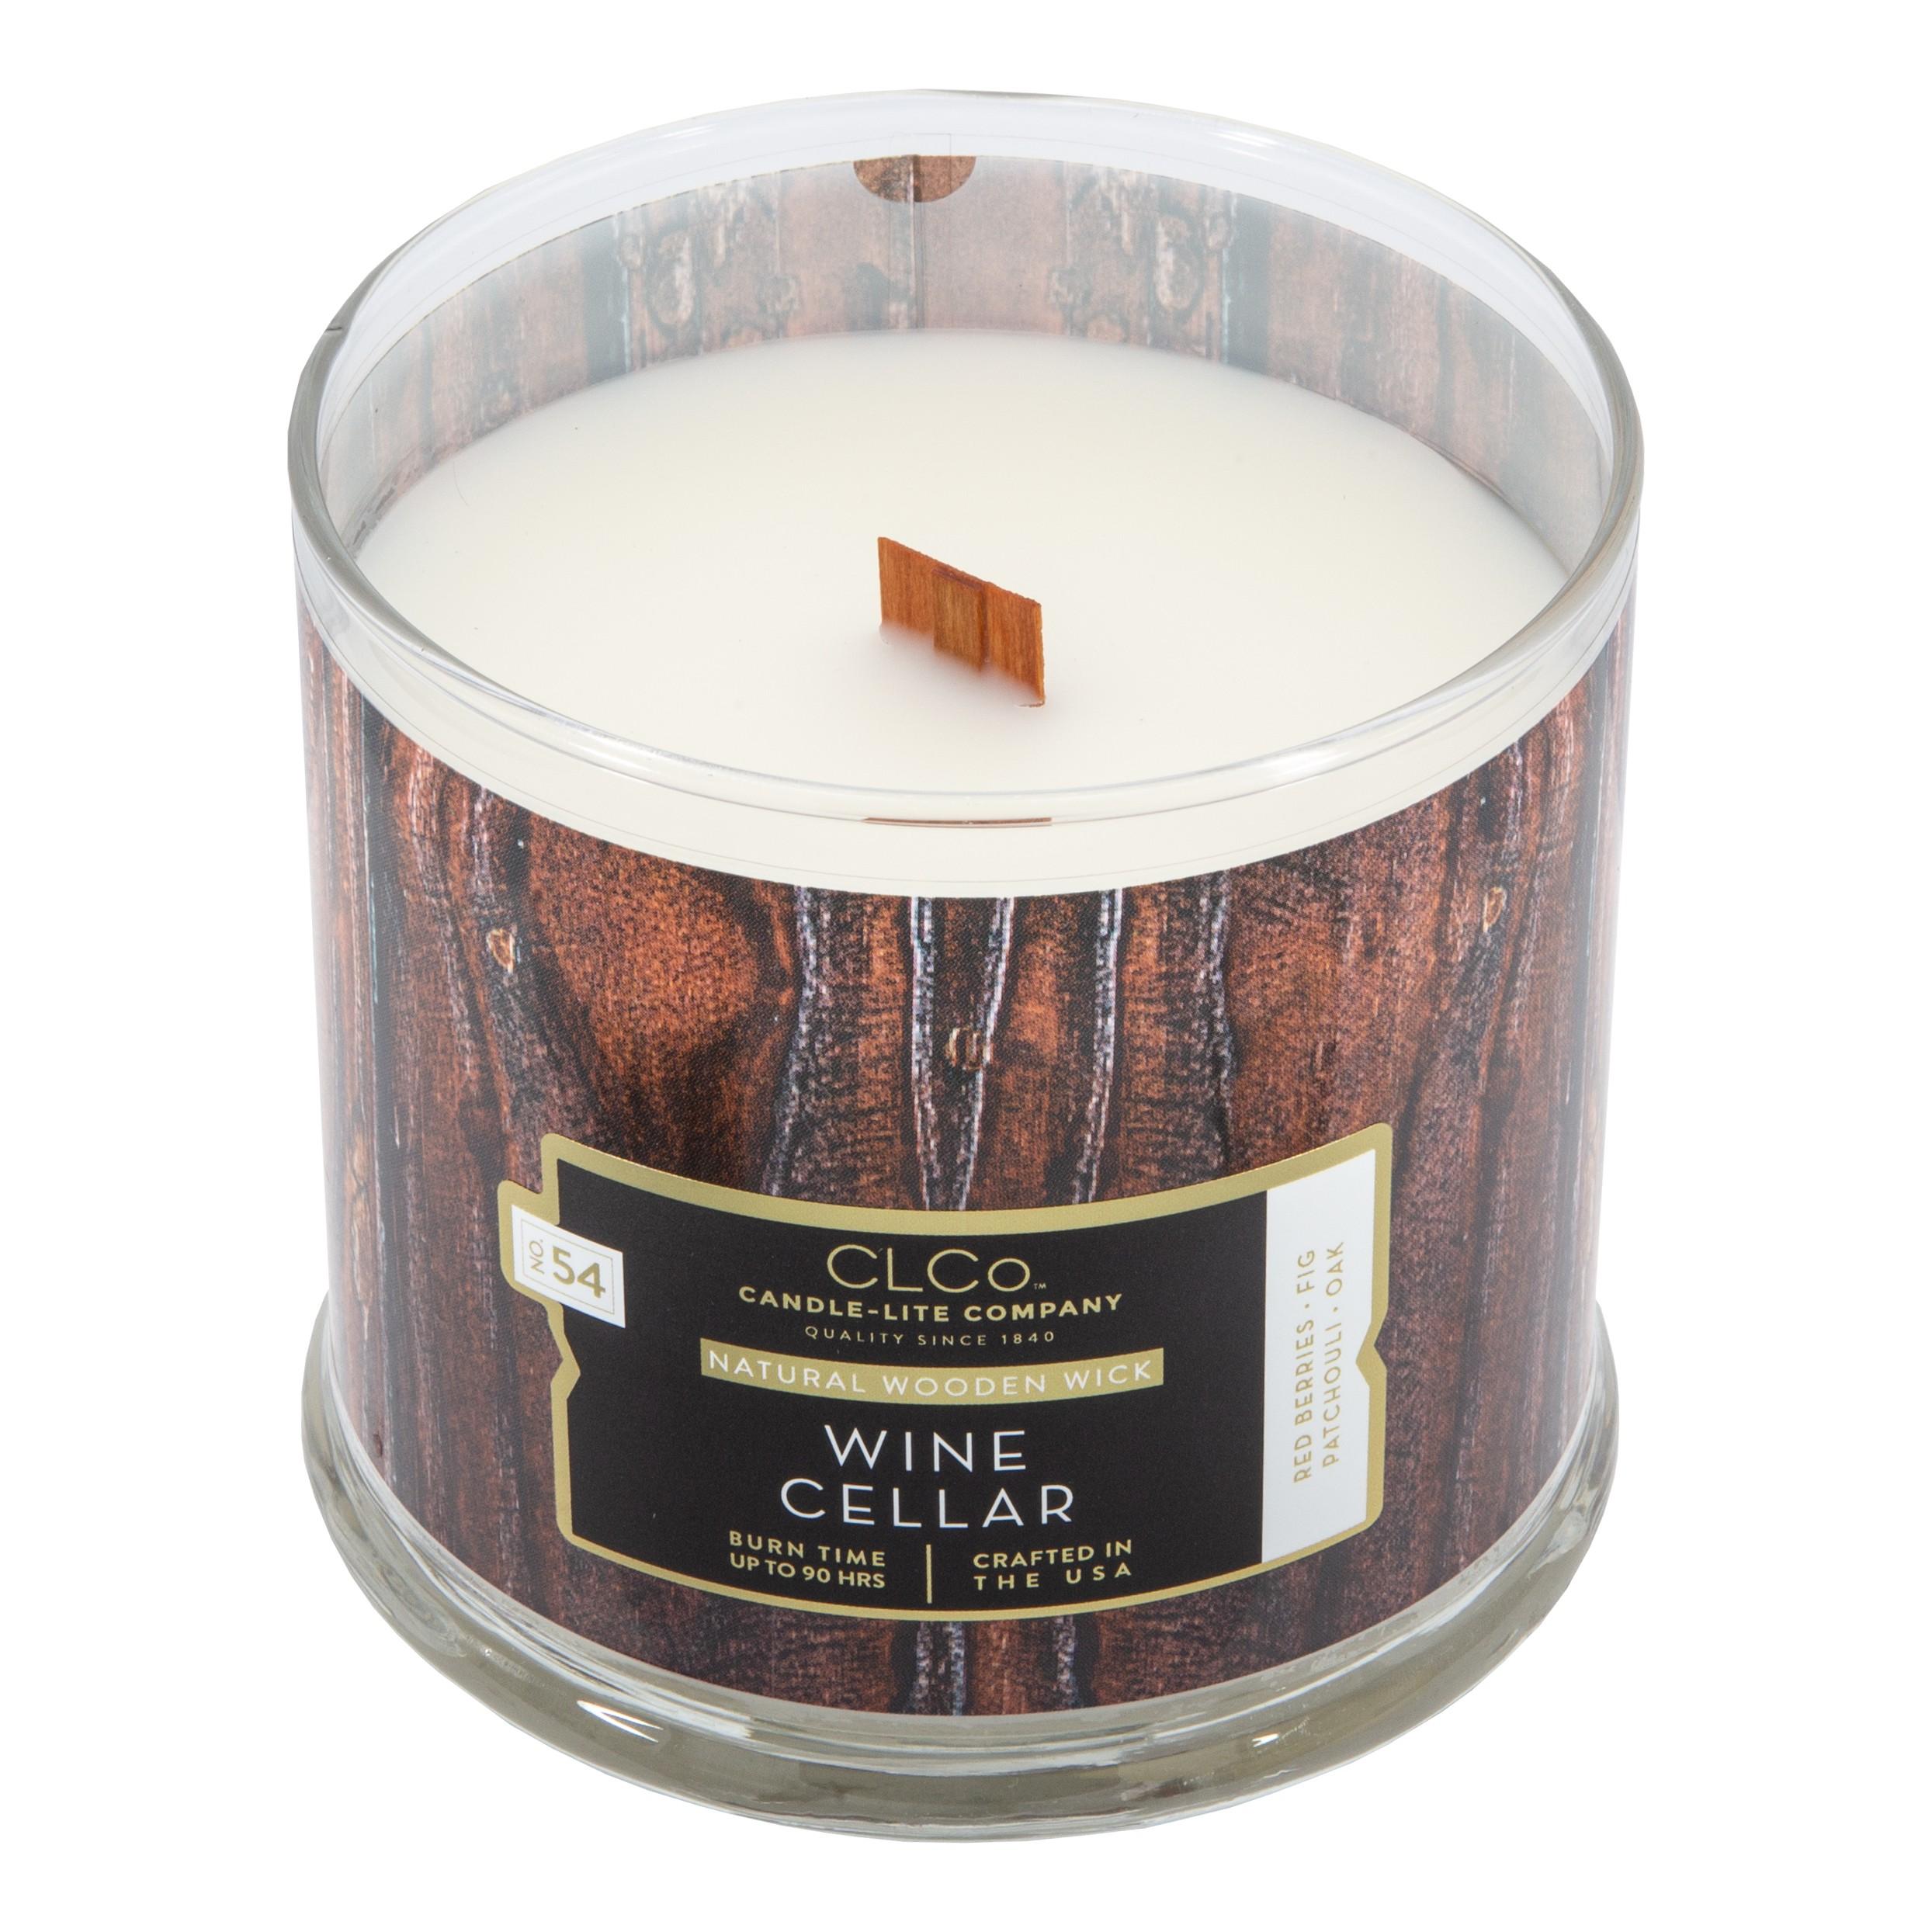 Duftkerze mit Holzdocht Wine Cellar, Candle-Lite Company